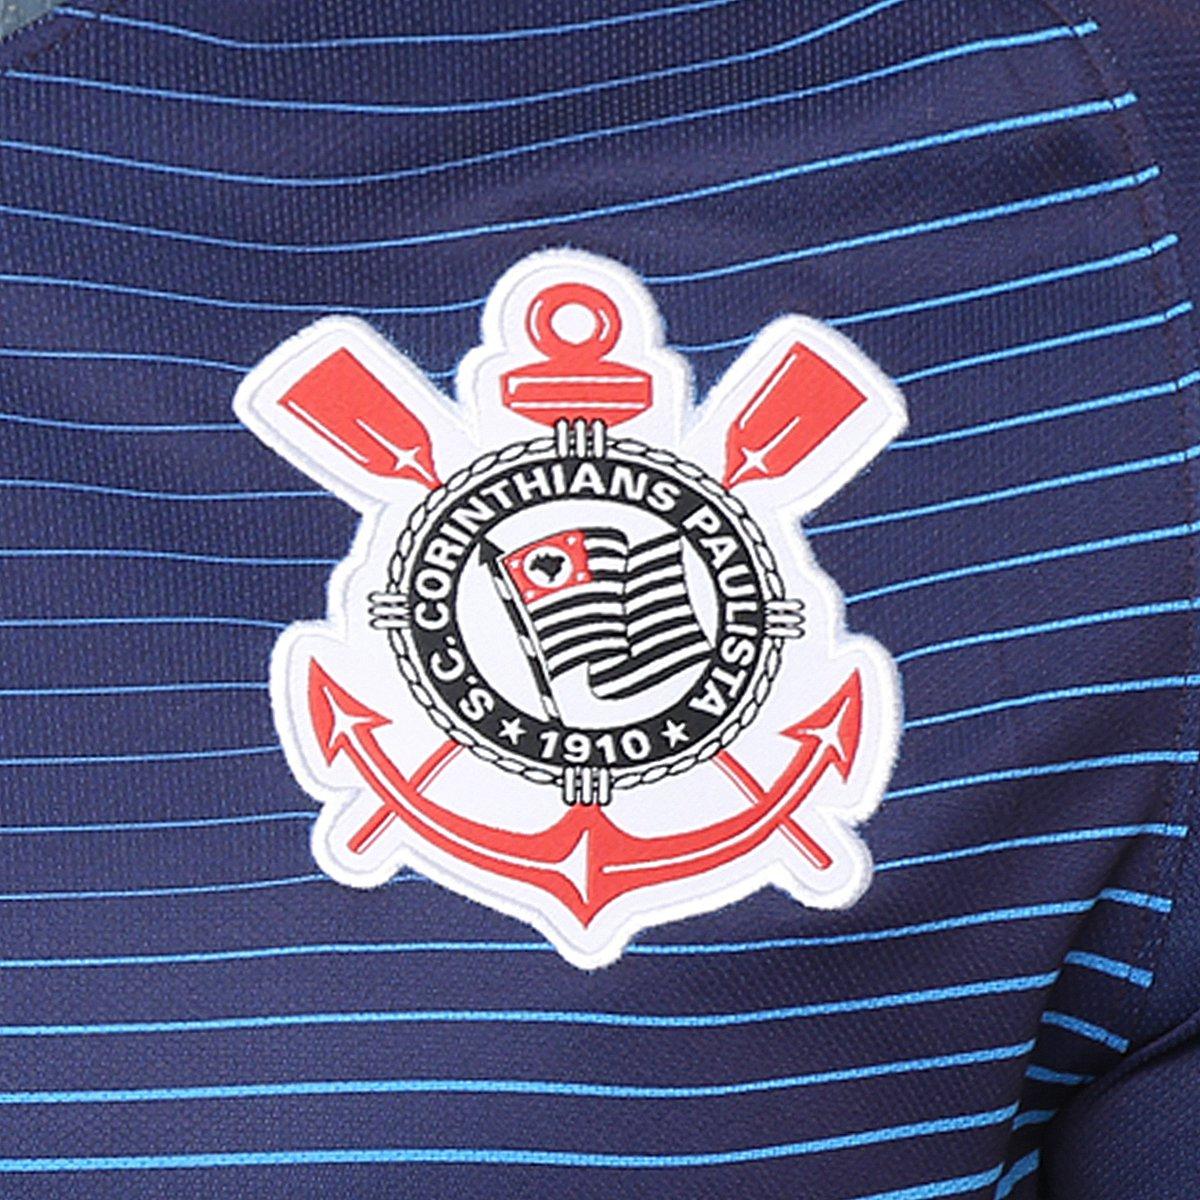 Camisa Corinthians III 2016 s nº Torcedor Nike Masculina - Compre ... 6558b987ff9dc